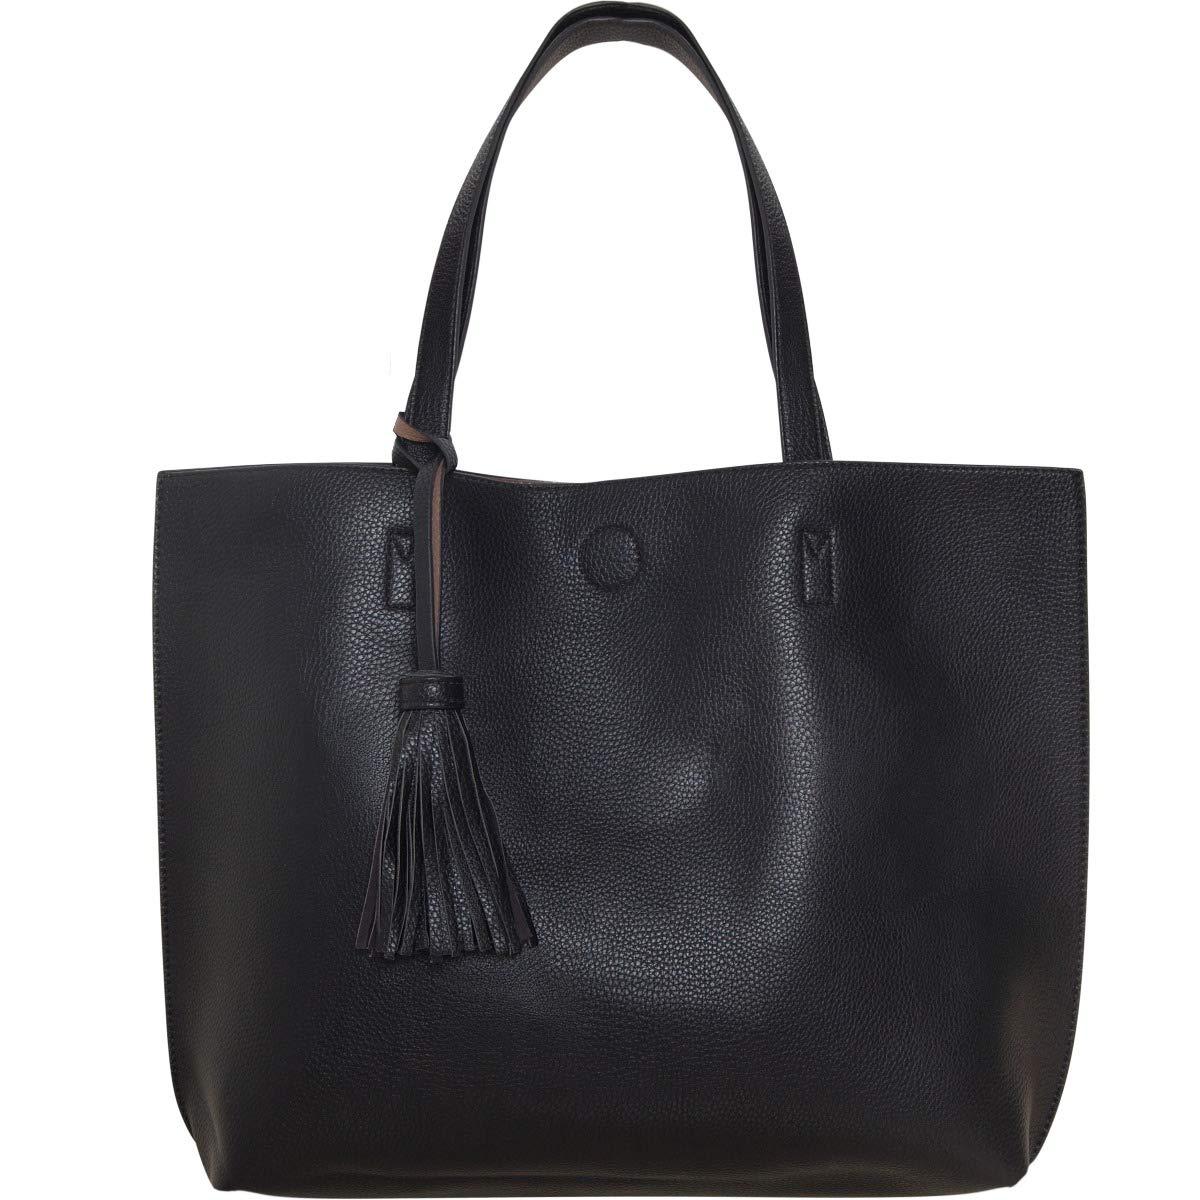 3a8341f352dd Amazon.com  Humble Chic Large Vegan Leather Tote Bag Reversible Shoulder  Handbag Tassel Purse